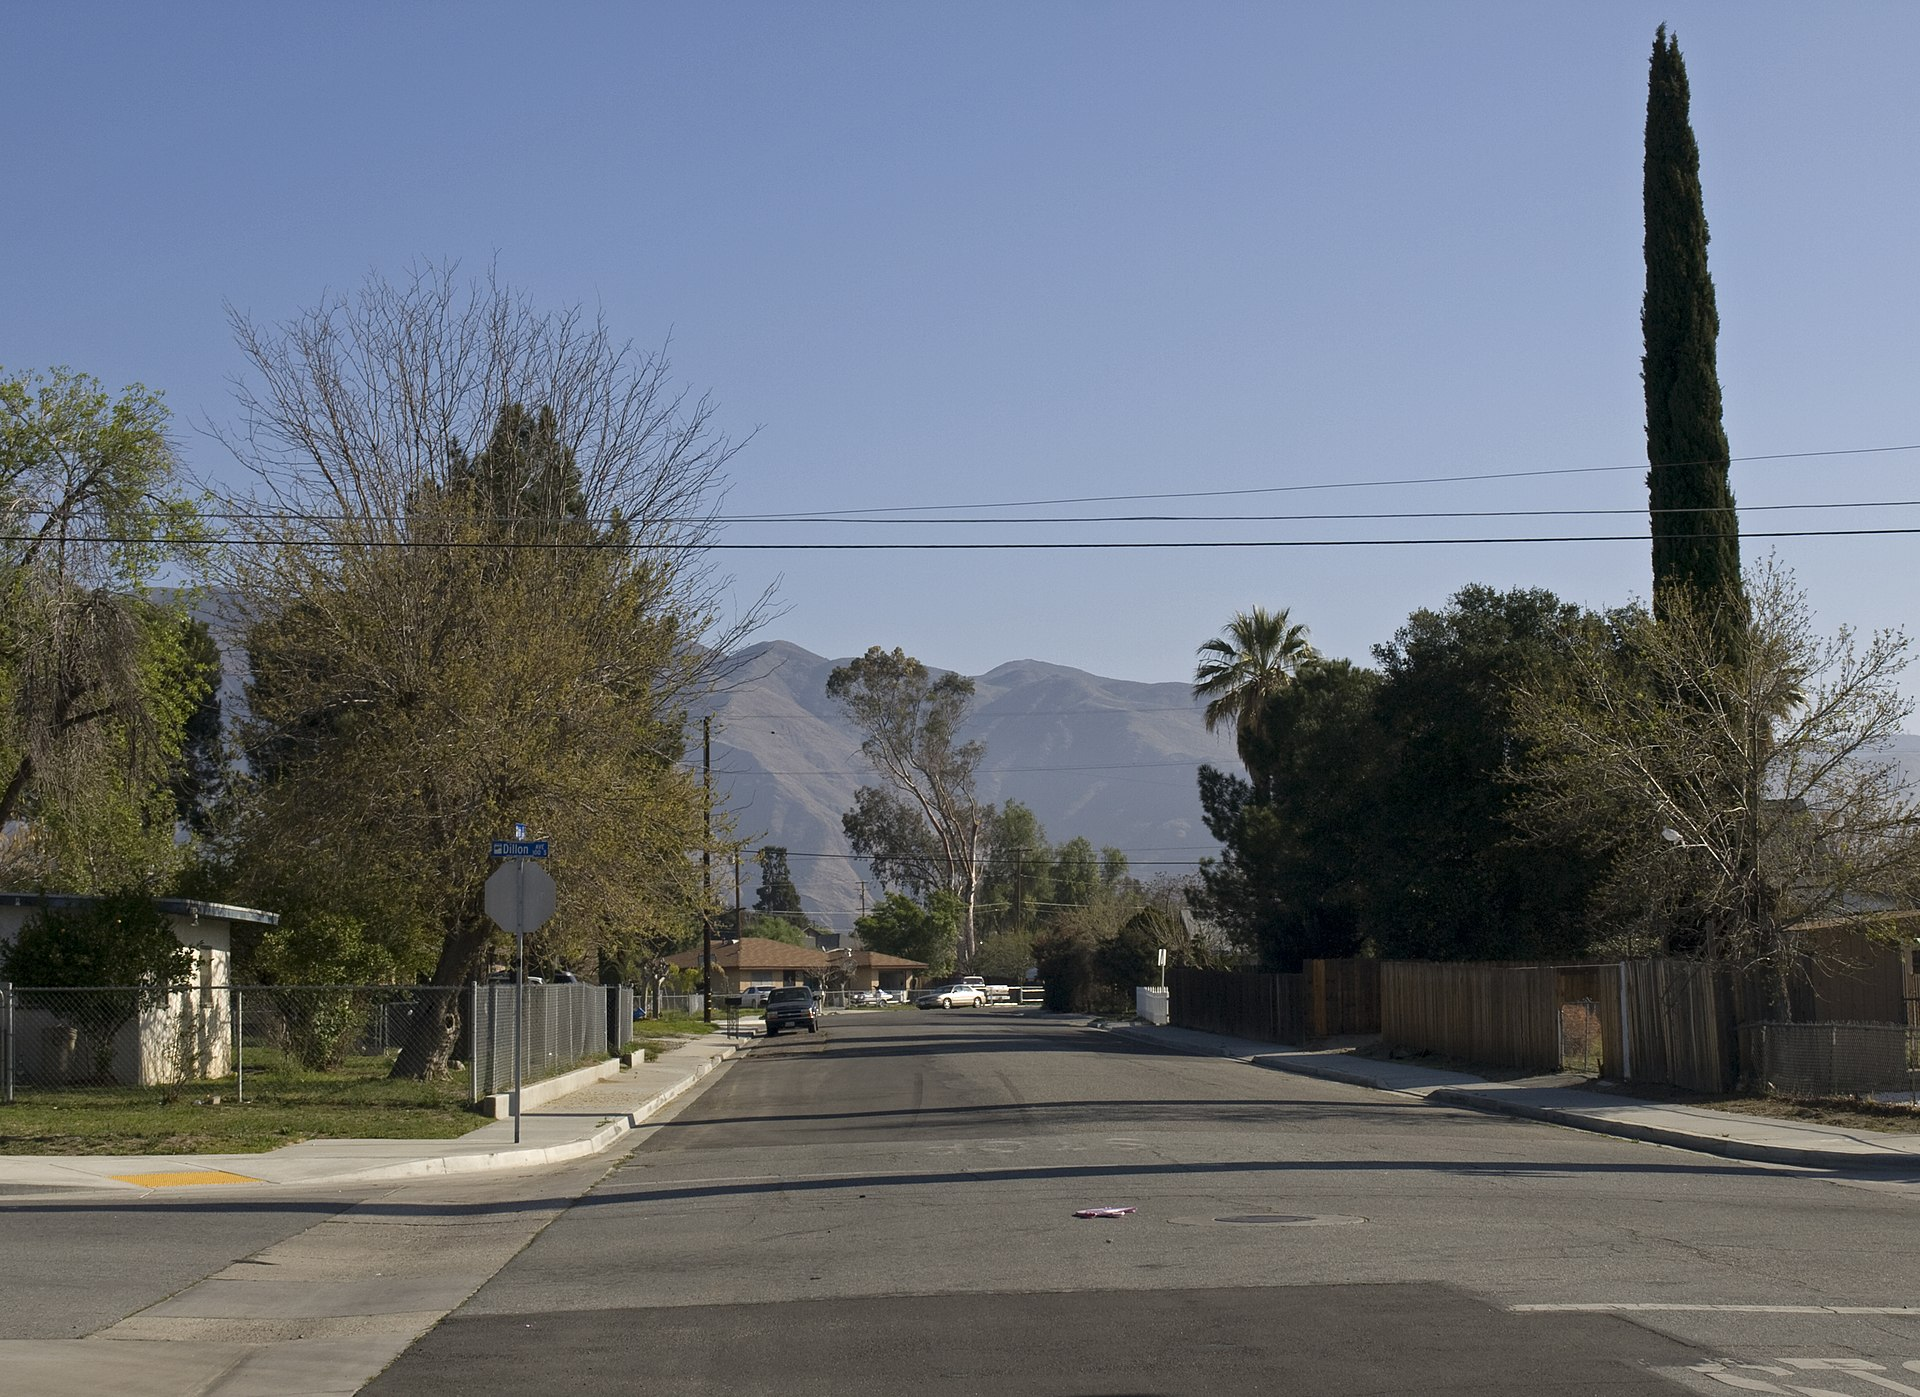 Personals in san jacinto ca Riverside - San Bernardino Casual Dating Classified Ads